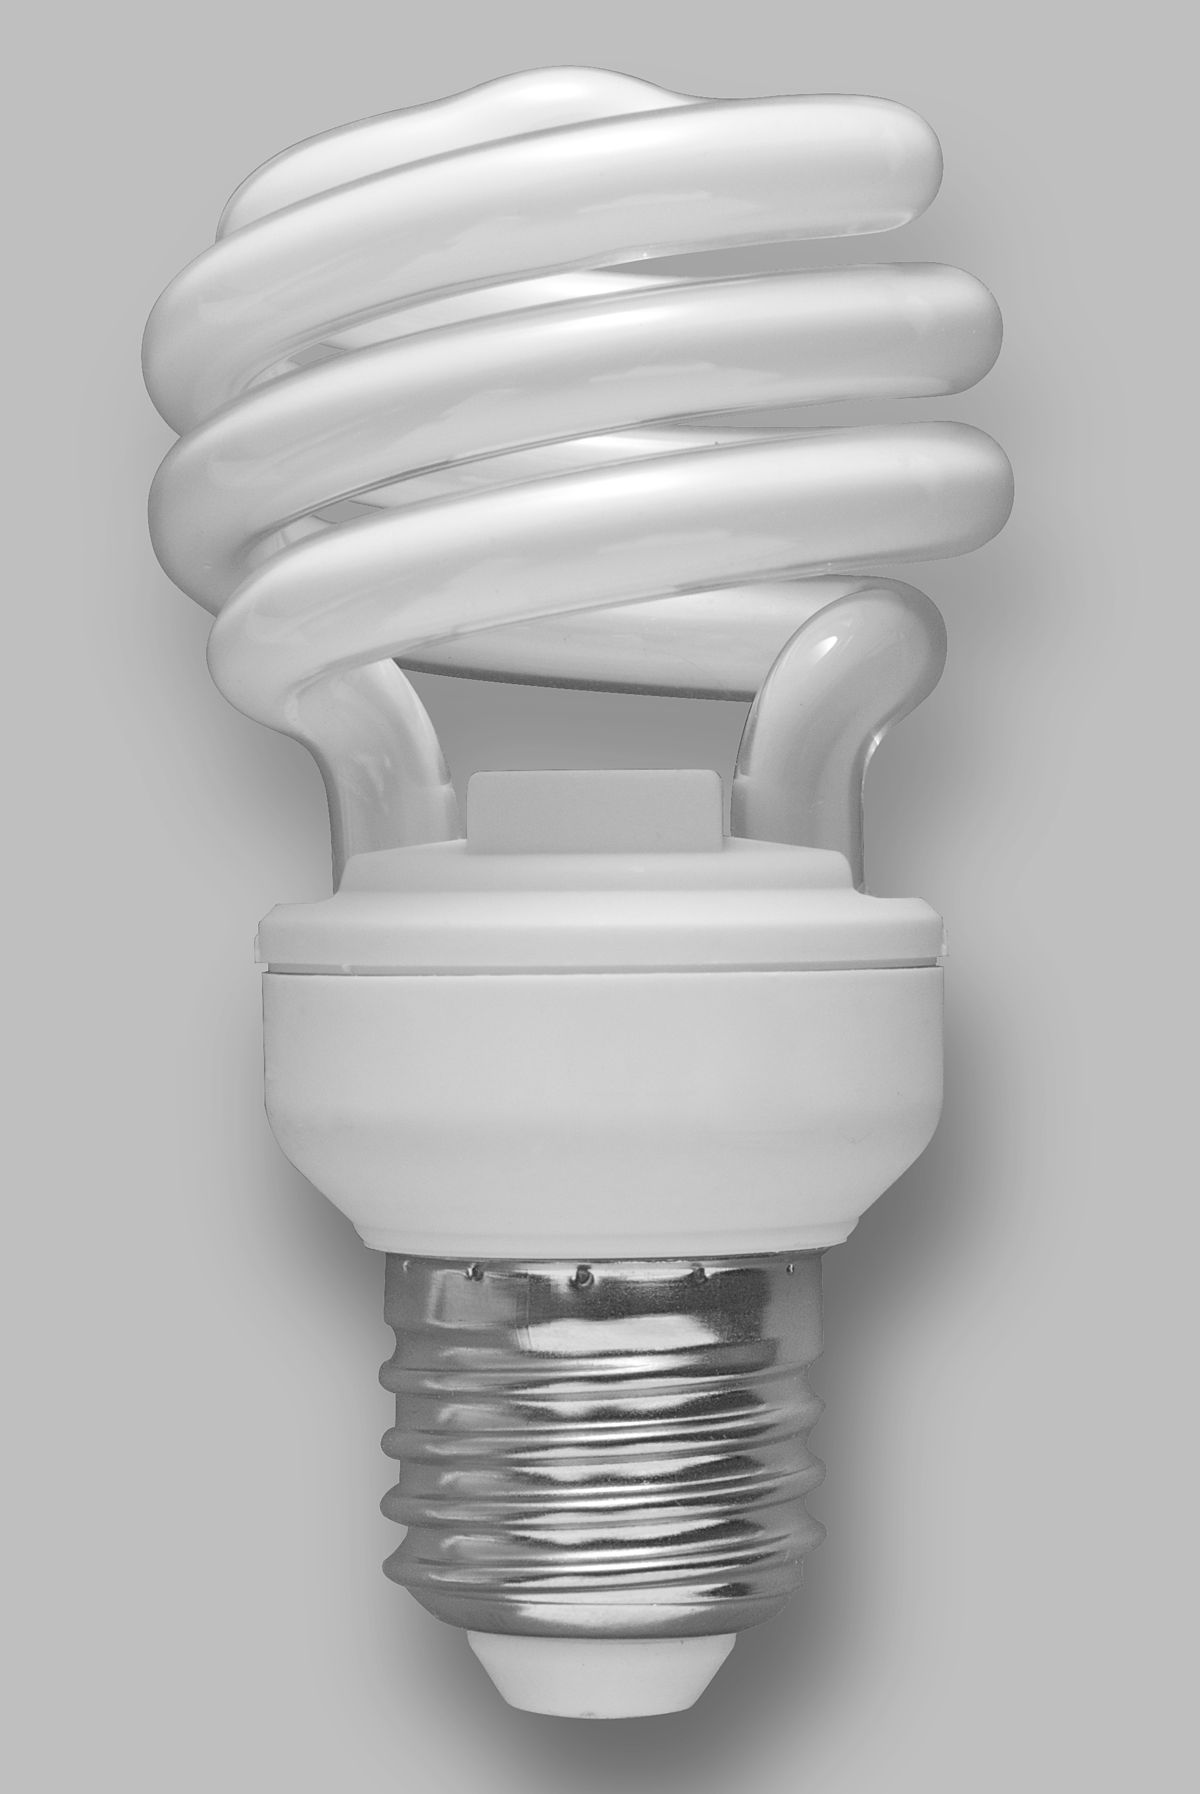 Cfl Light Bulb Facts